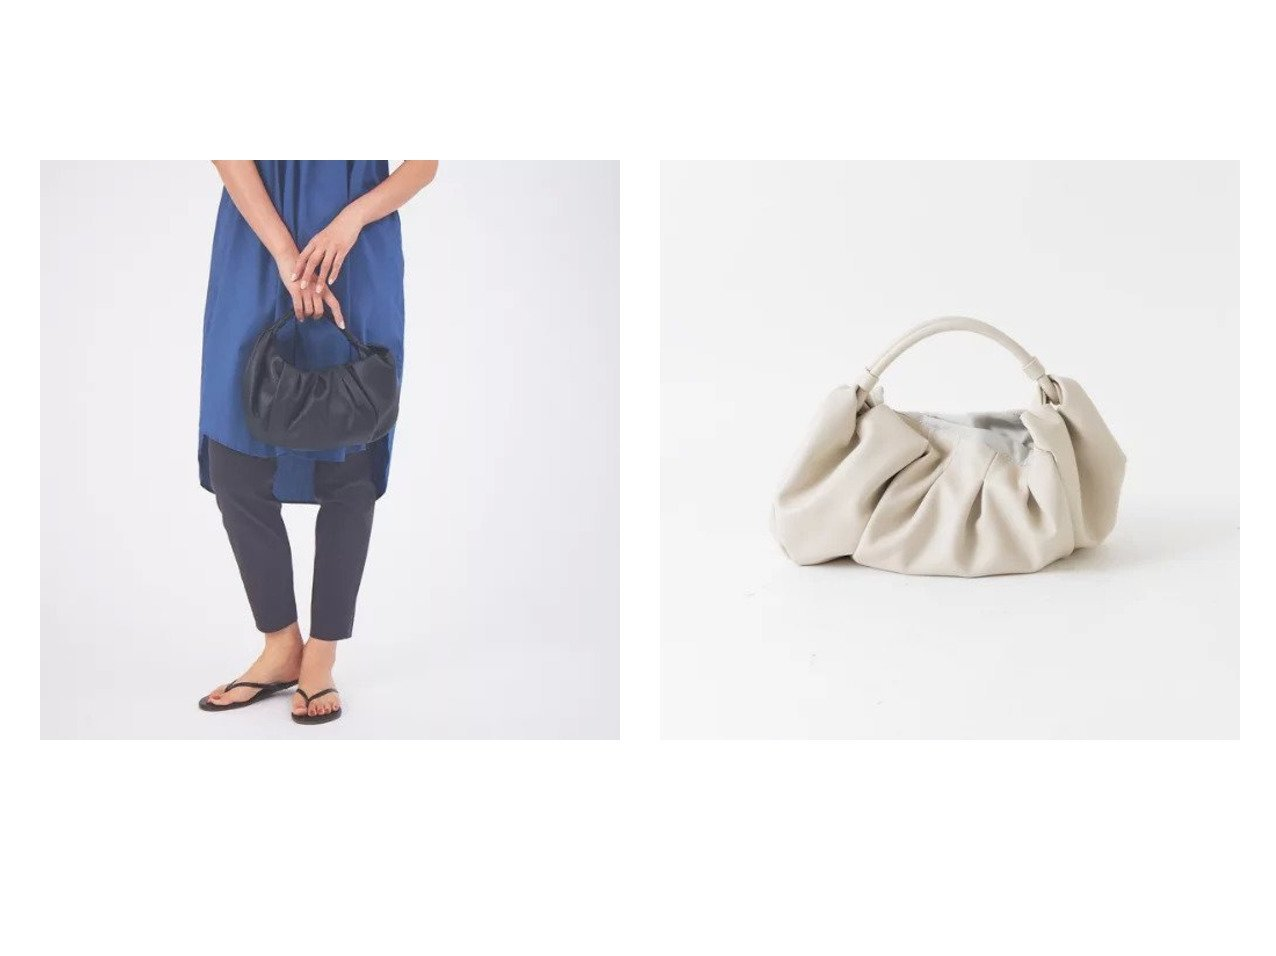 【qualite/カリテ】の【ADD CULUMN】CHAOZ ハンドバッグ 【バッグ・鞄】おすすめ!人気、トレンド・レディースファッションの通販  おすすめで人気の流行・トレンド、ファッションの通販商品 インテリア・家具・メンズファッション・キッズファッション・レディースファッション・服の通販 founy(ファニー) https://founy.com/ ファッション Fashion レディースファッション WOMEN バッグ Bag ギャザー ハンドバッグ フォルム ベーシック  ID:crp329100000062325